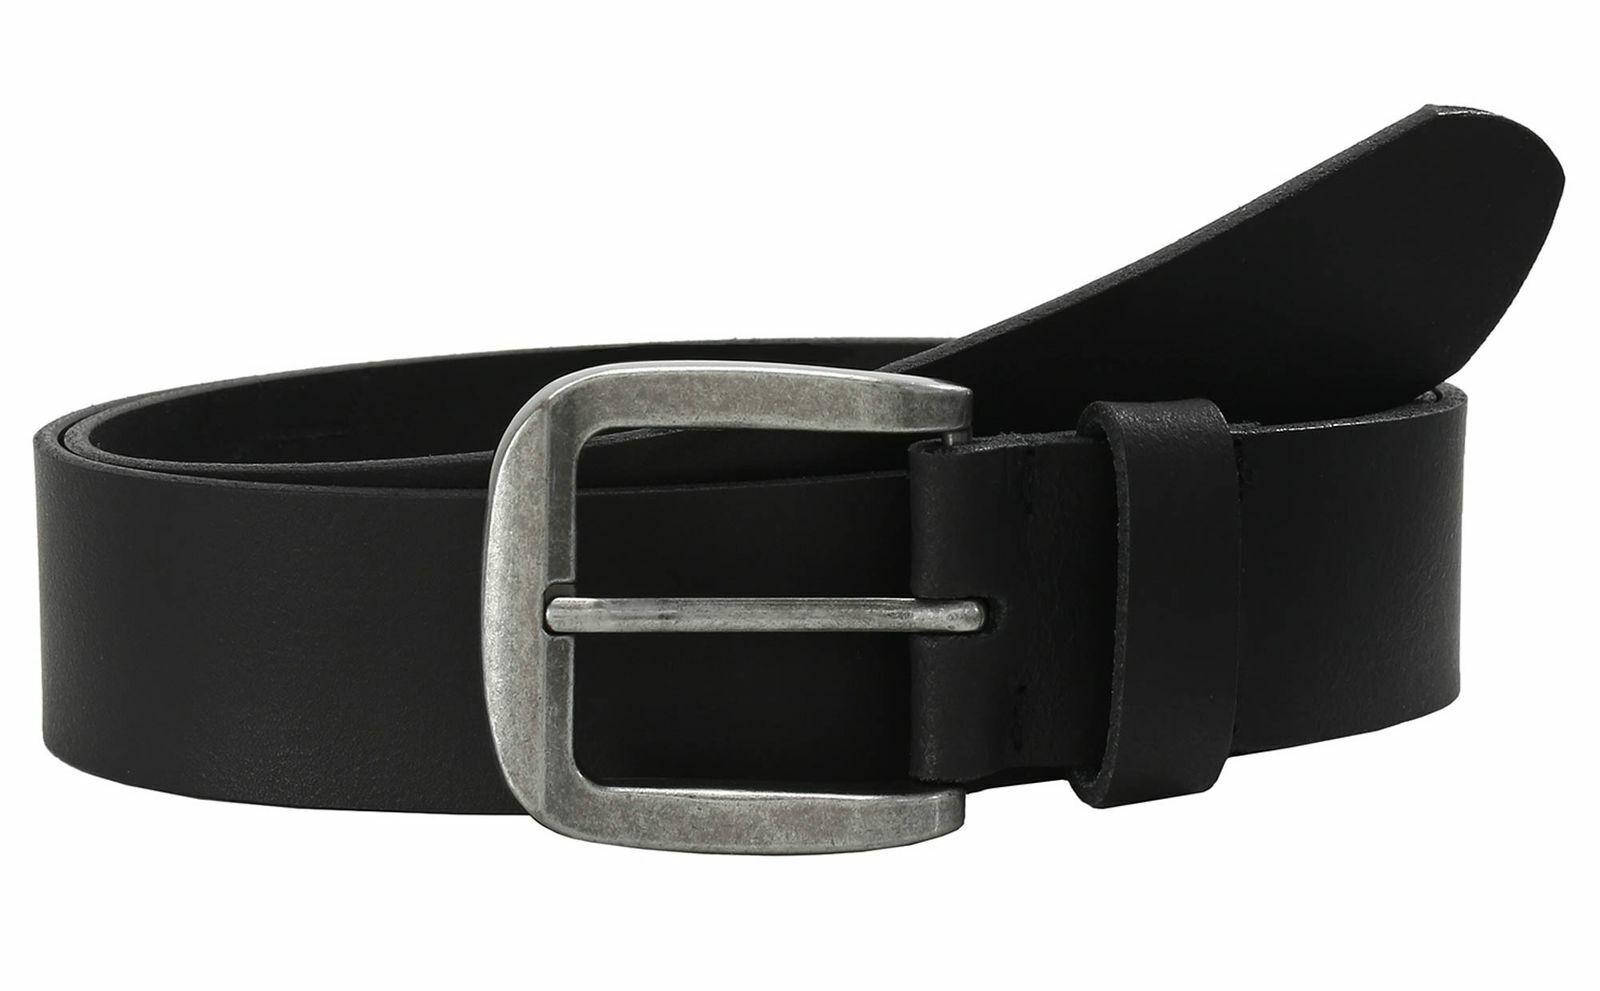 LLOYD Fashion Leather Belt 4.0 W115 Gürtel Accessoire Black Schwarz